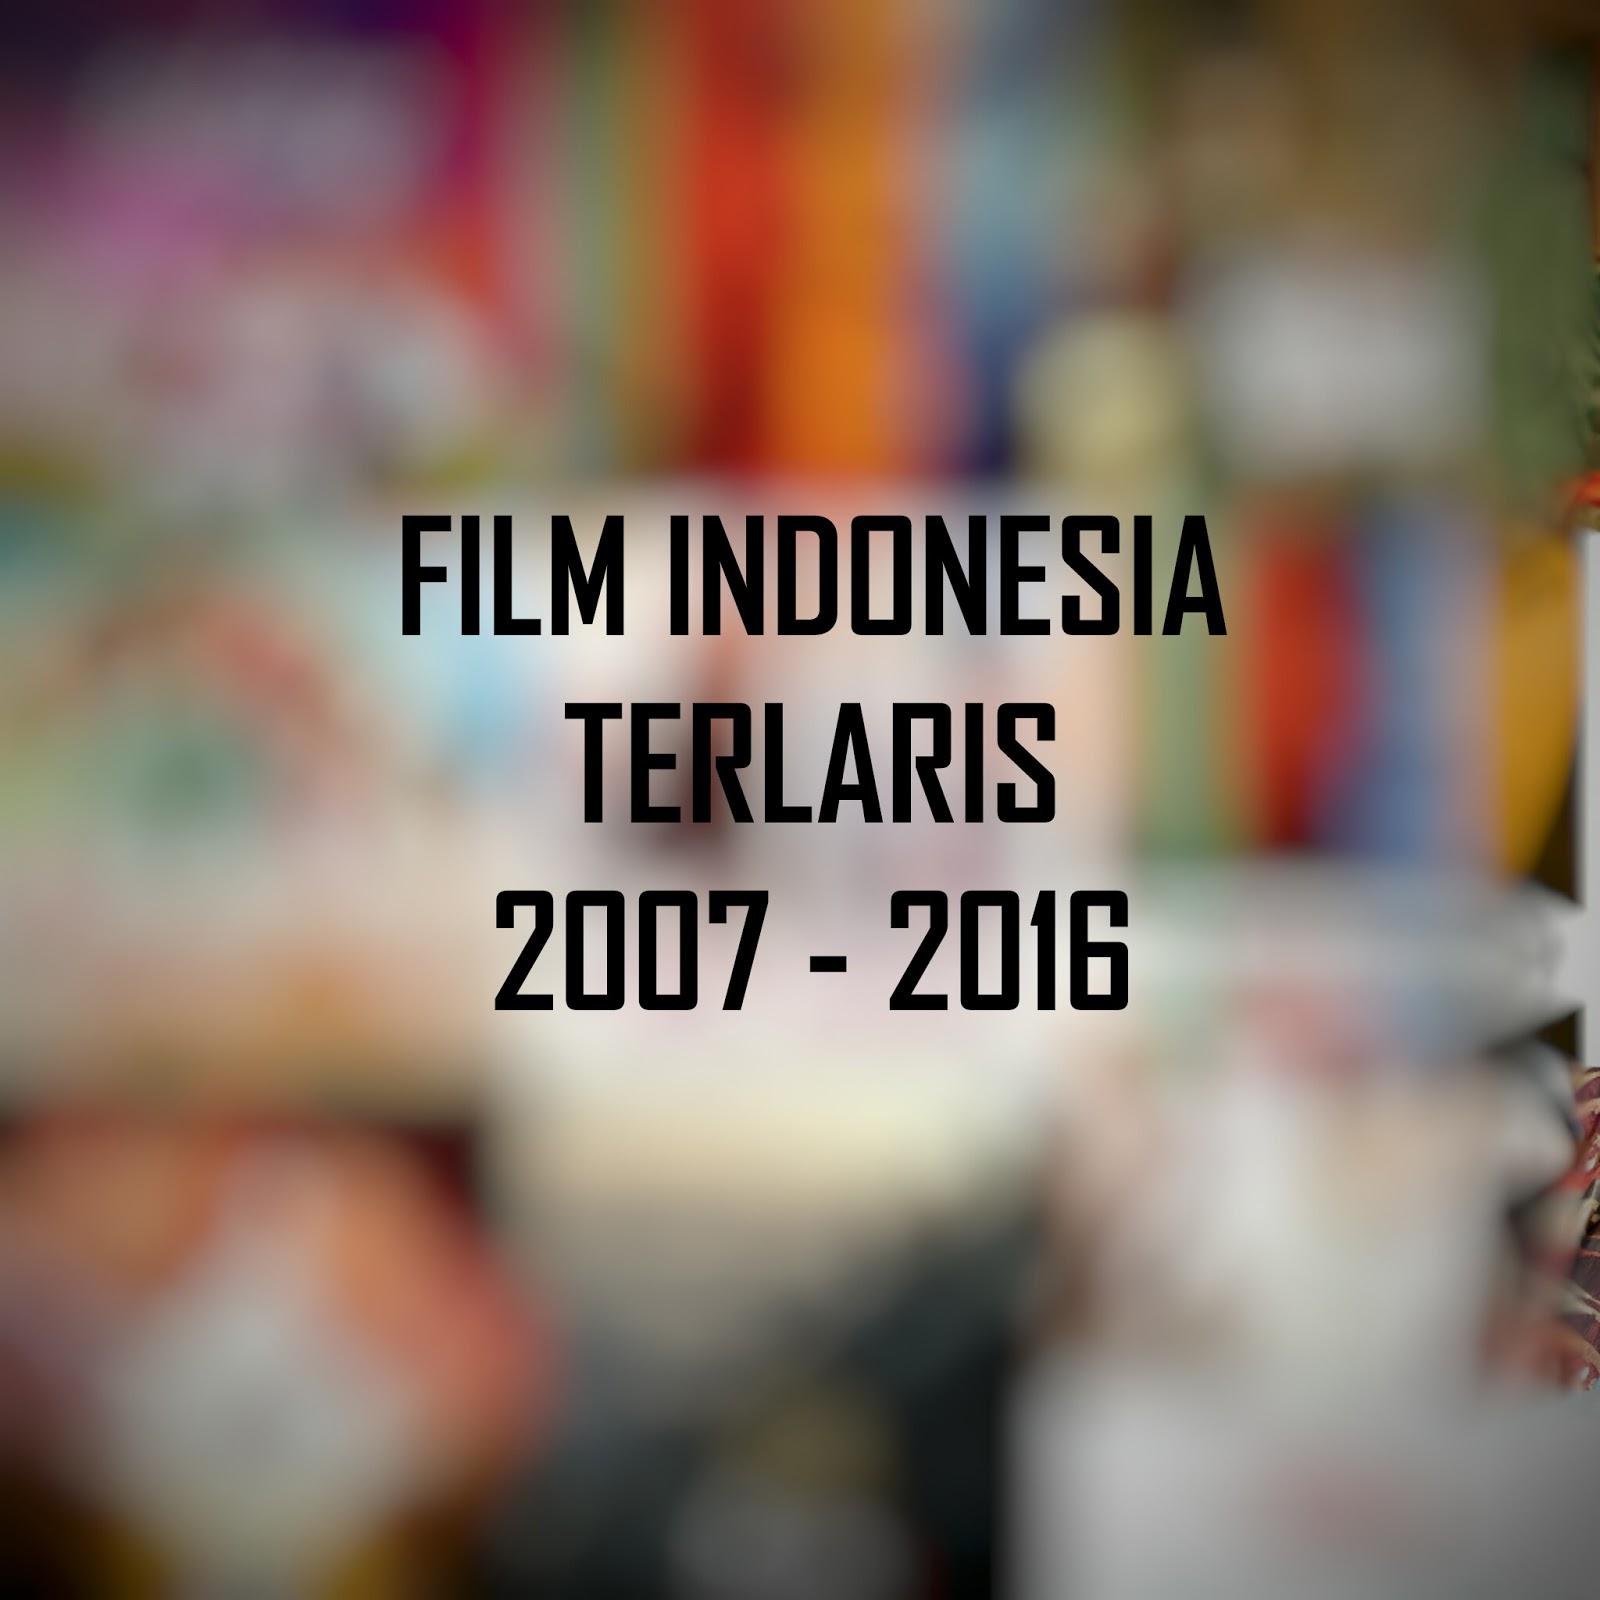 FILM INDONESIA TERLARIS ~ Movieholic Tasikmalaya